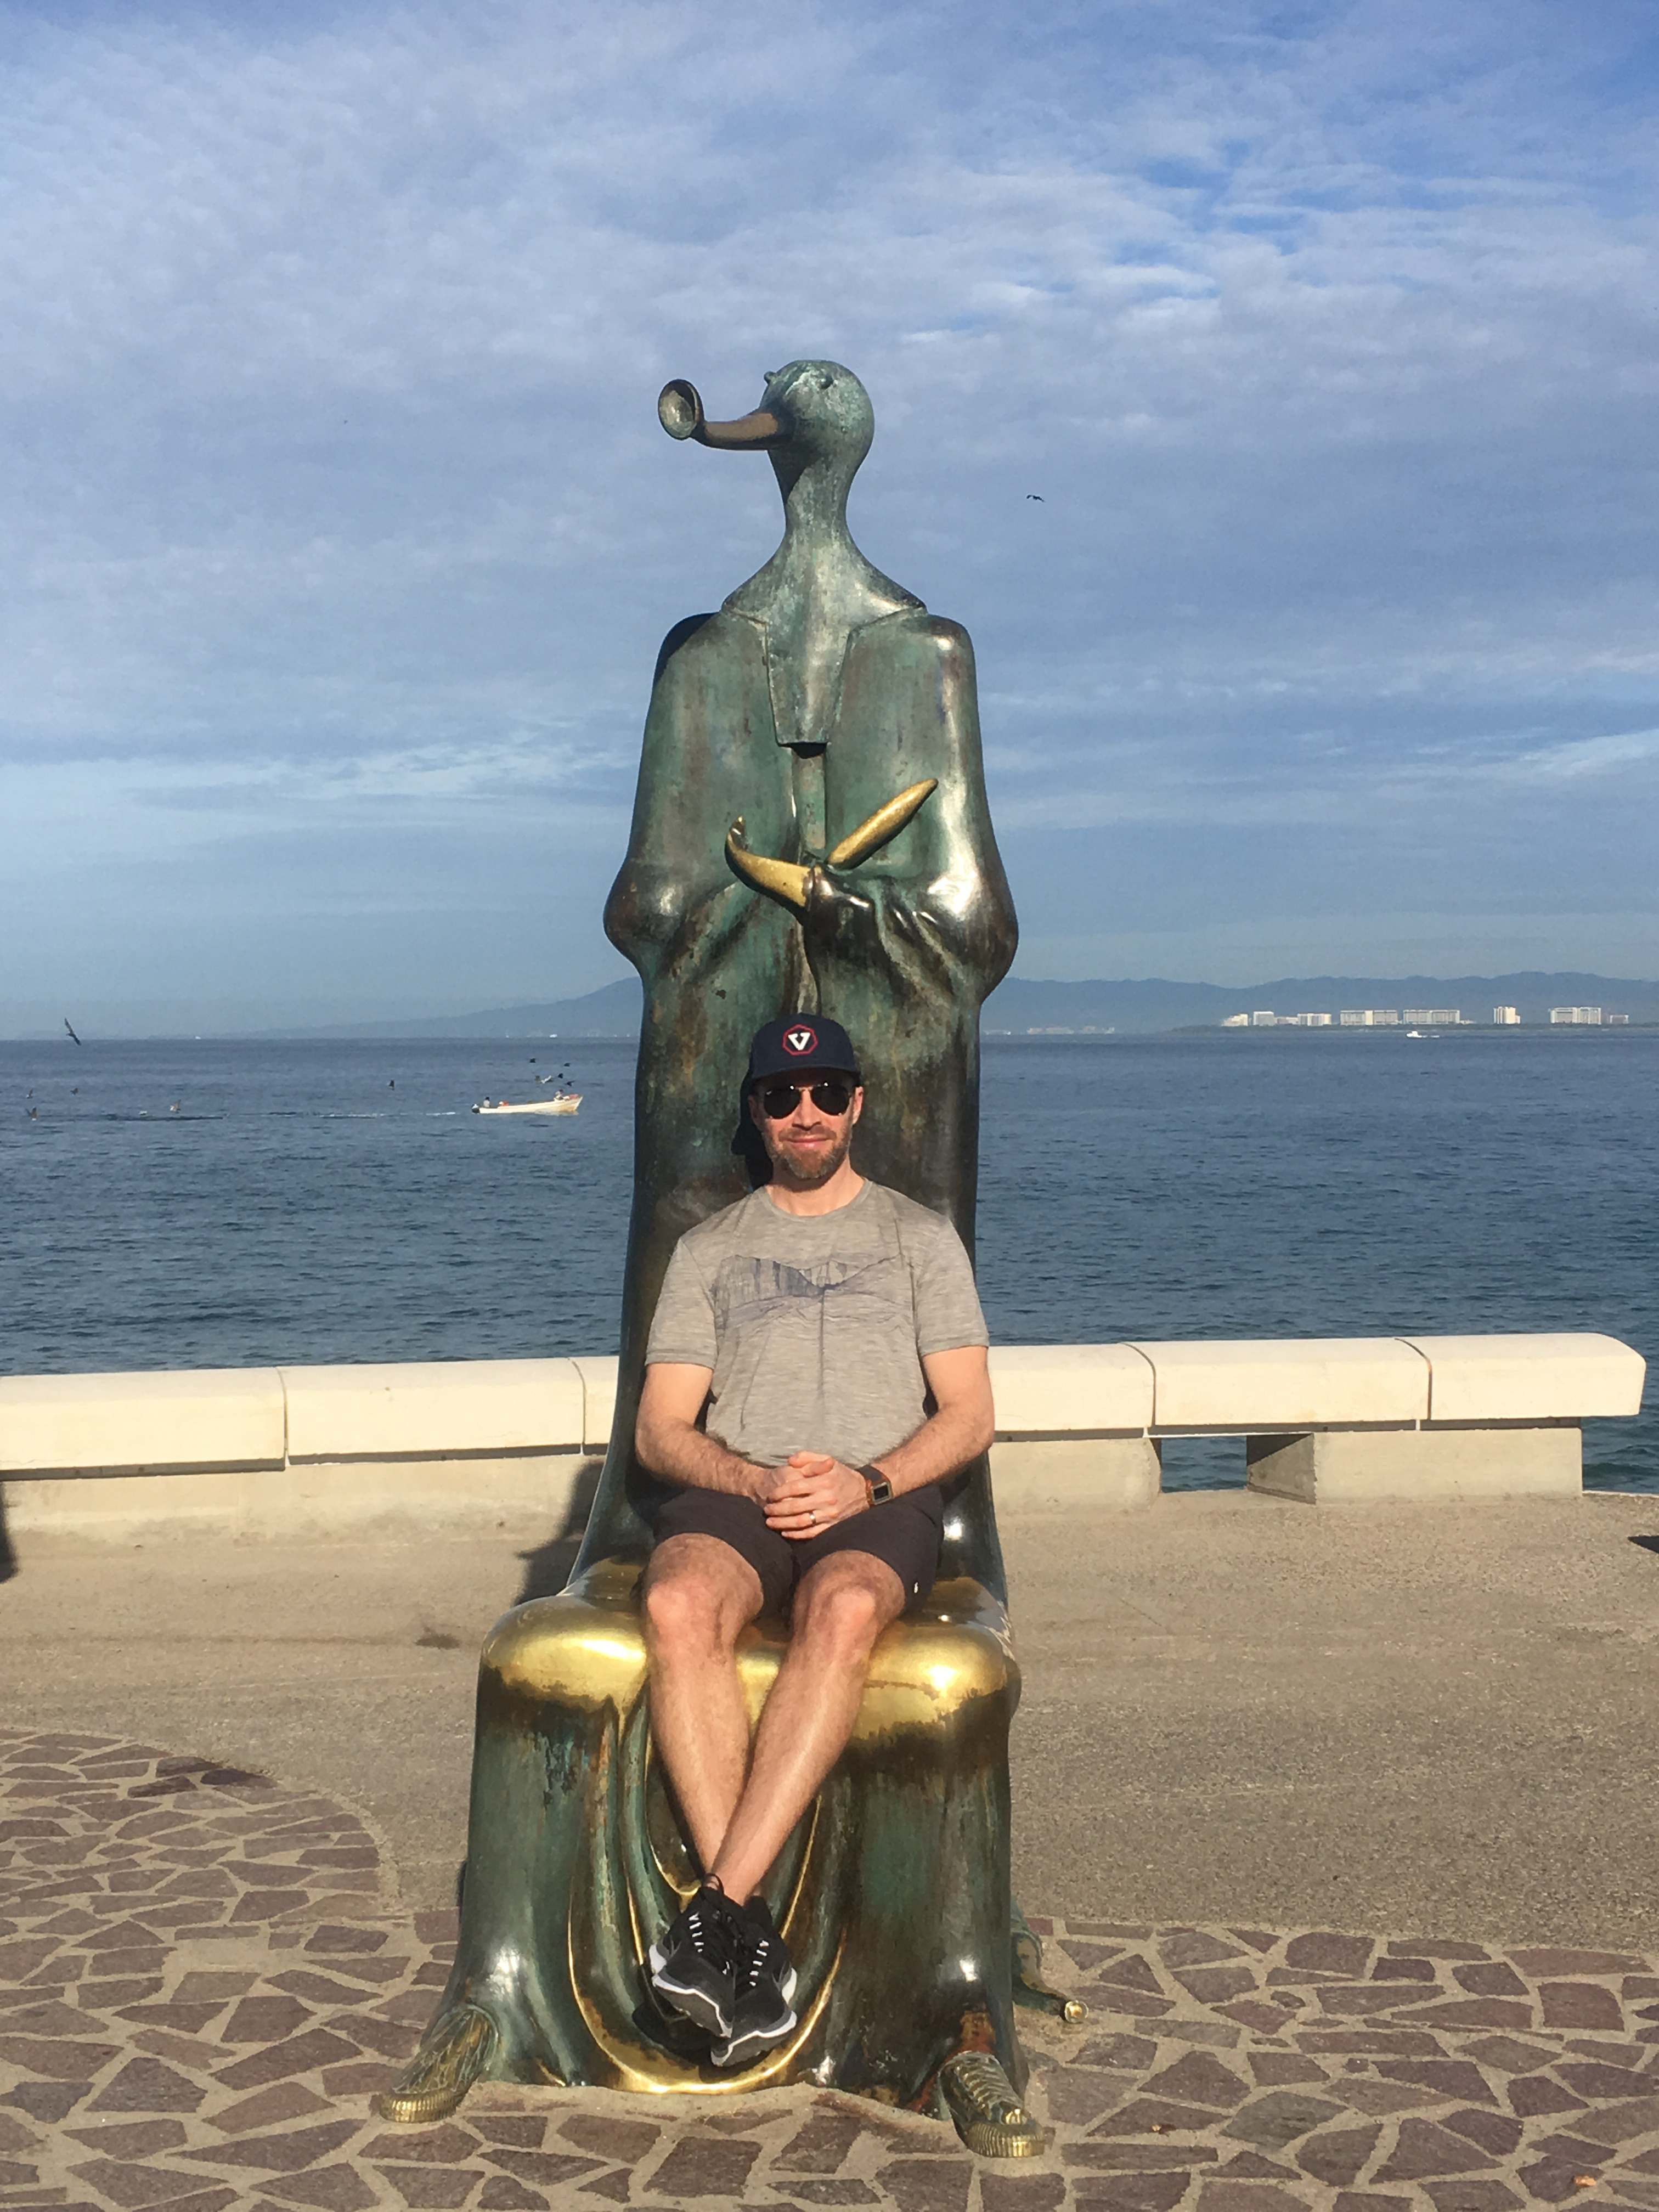 Creepy statue